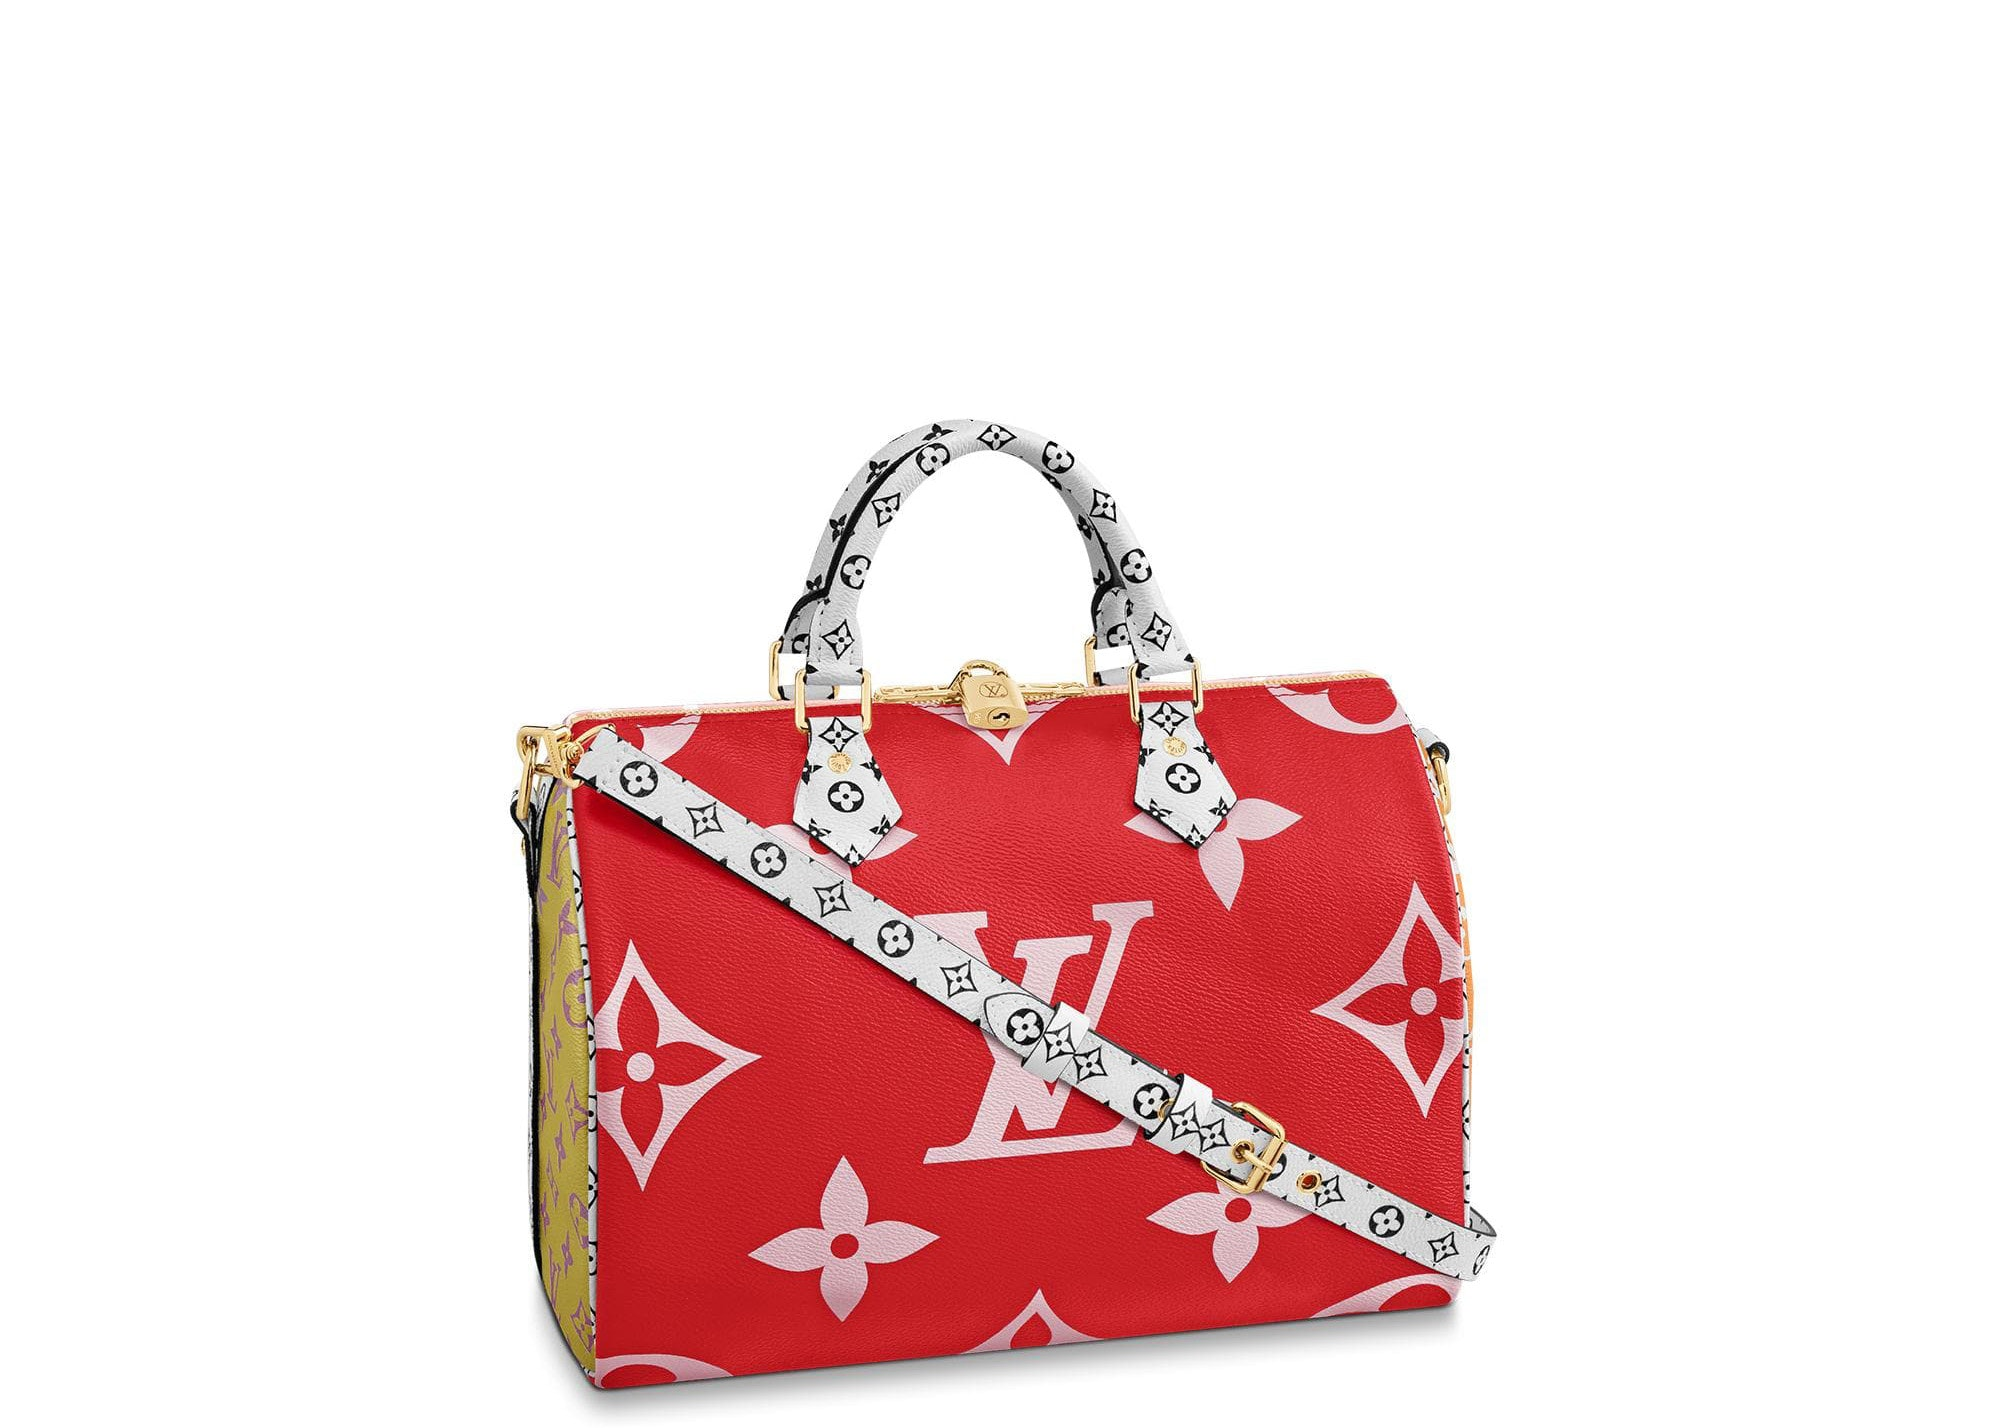 Louis Vuitton Speedy Bandouliere Monogram Giant 30 Red/Pink